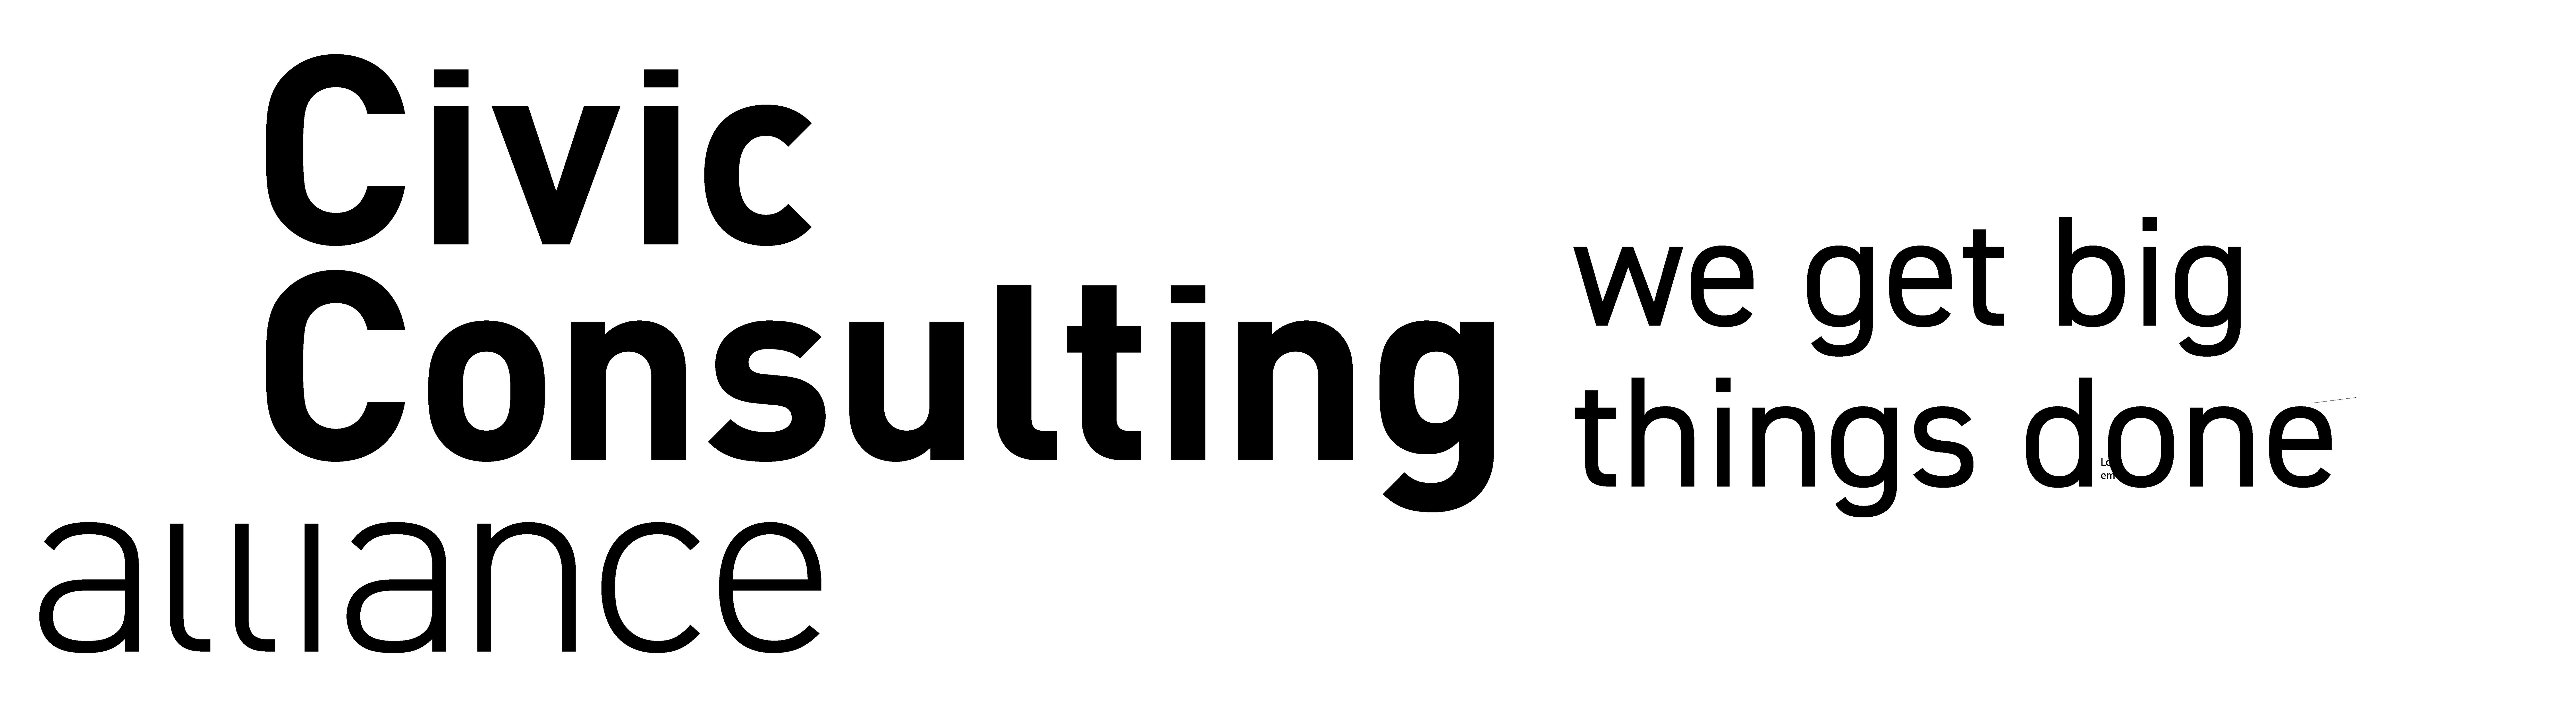 Civic Consulting Alliance logo